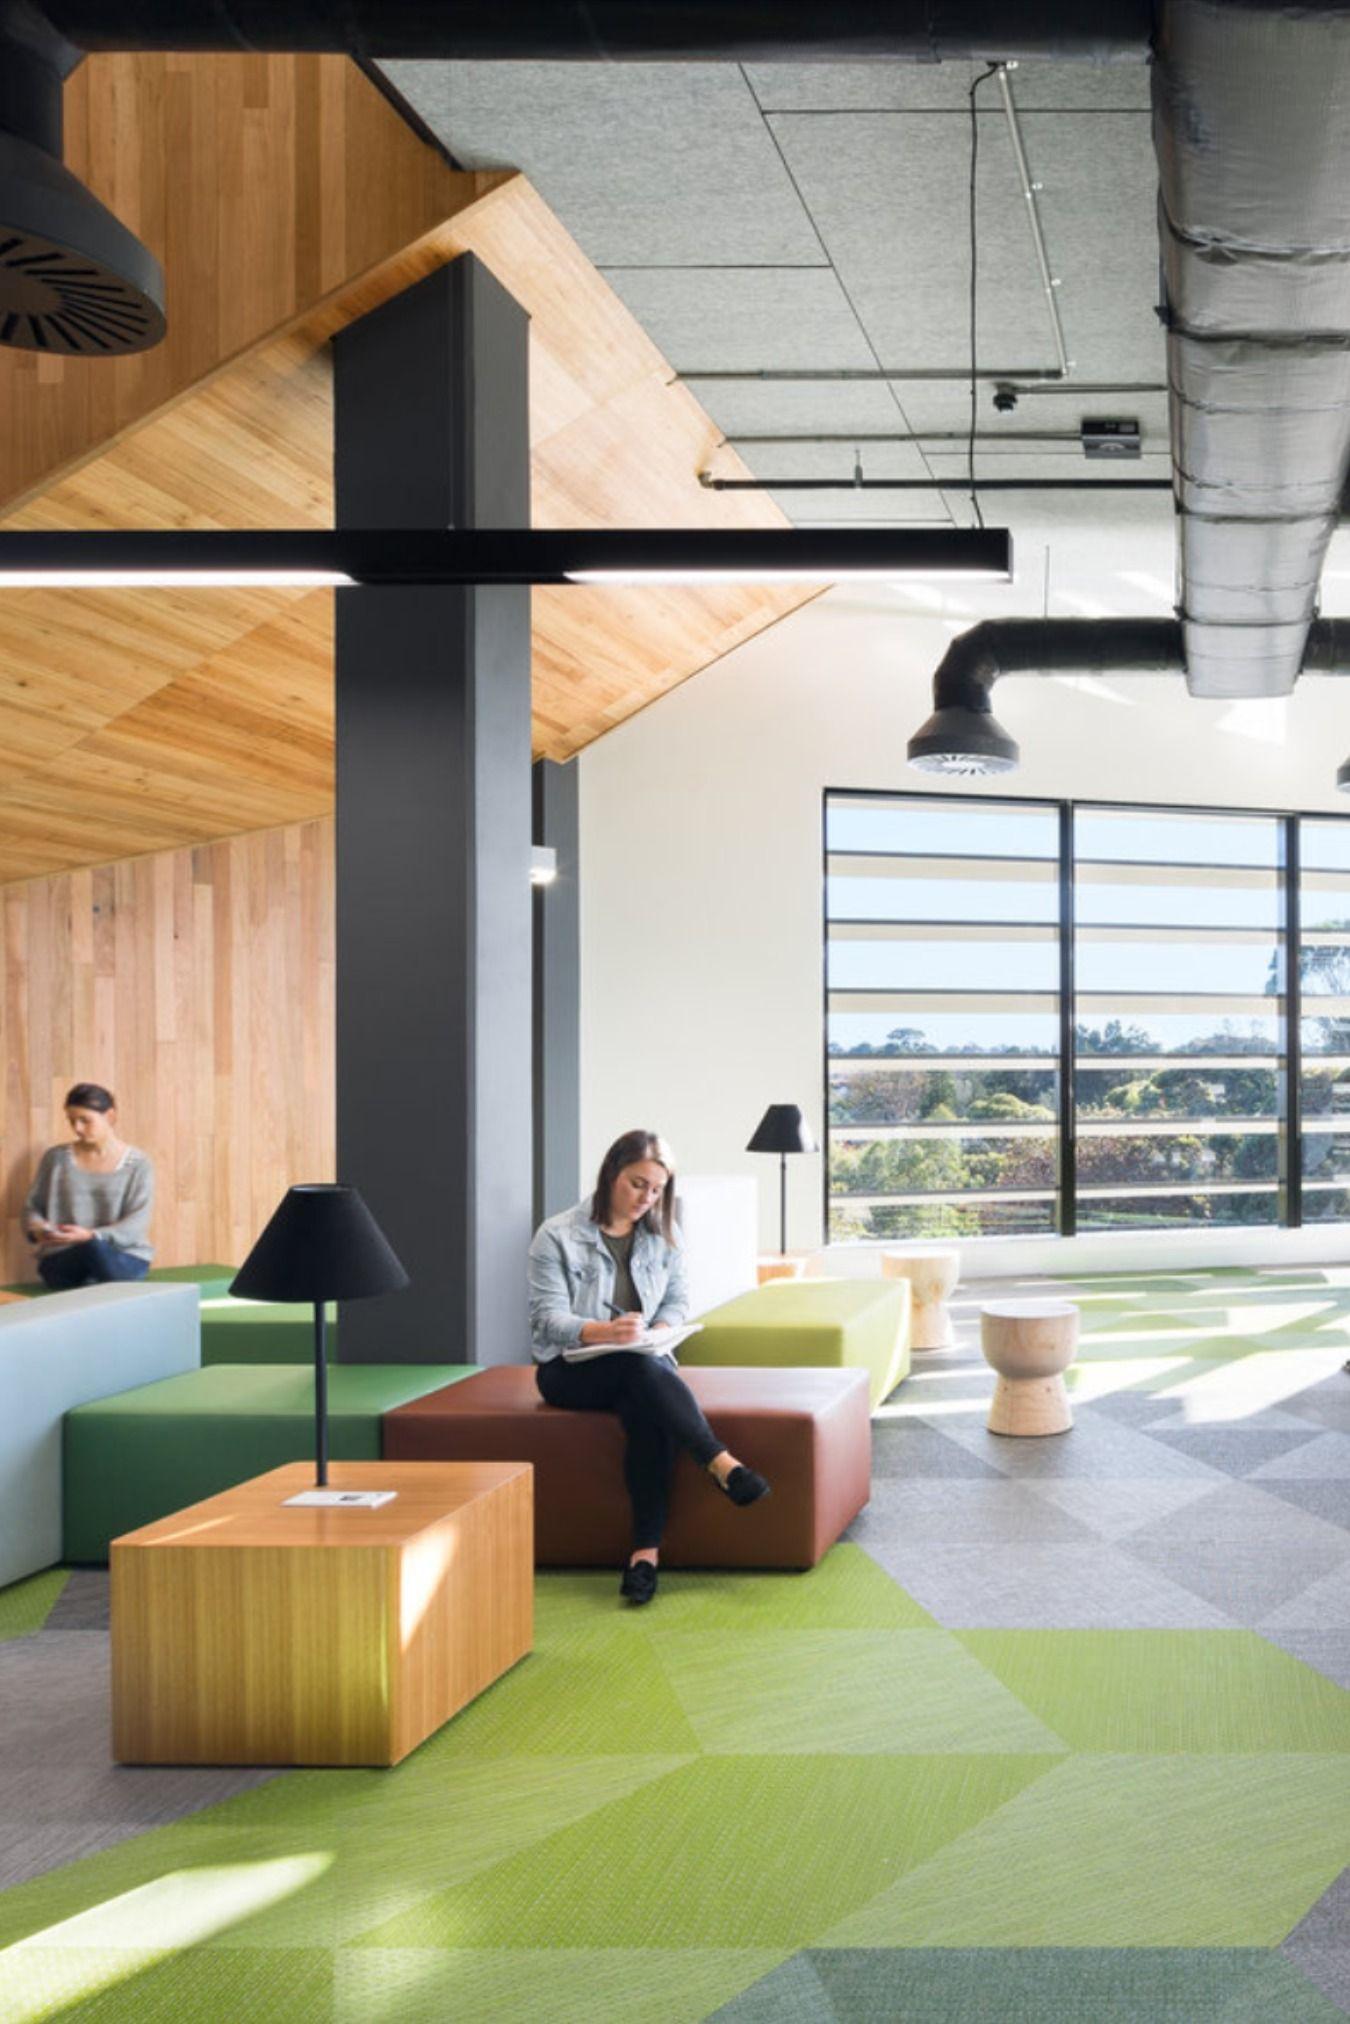 UNIVERSITY OF MELBOURNE UVET WERRIBEE in 2020 Interior